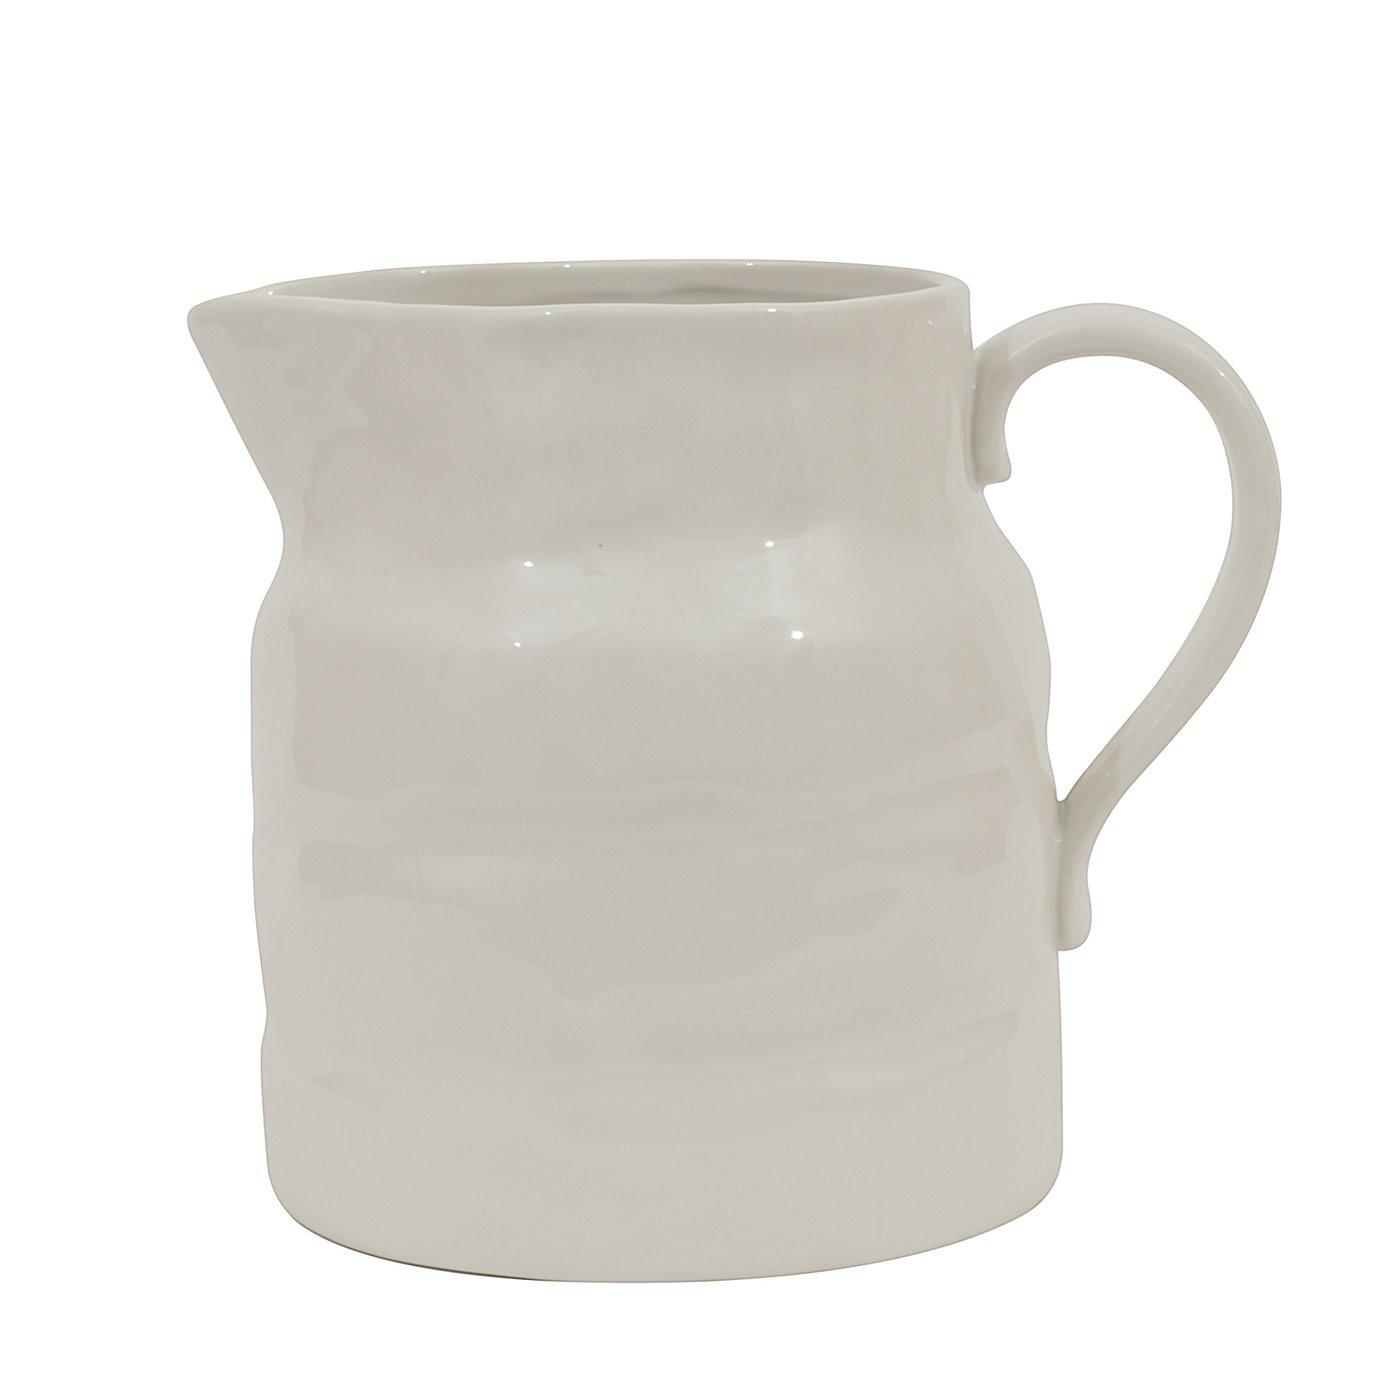 White Vintage Stoneware Pitcher Reproduction